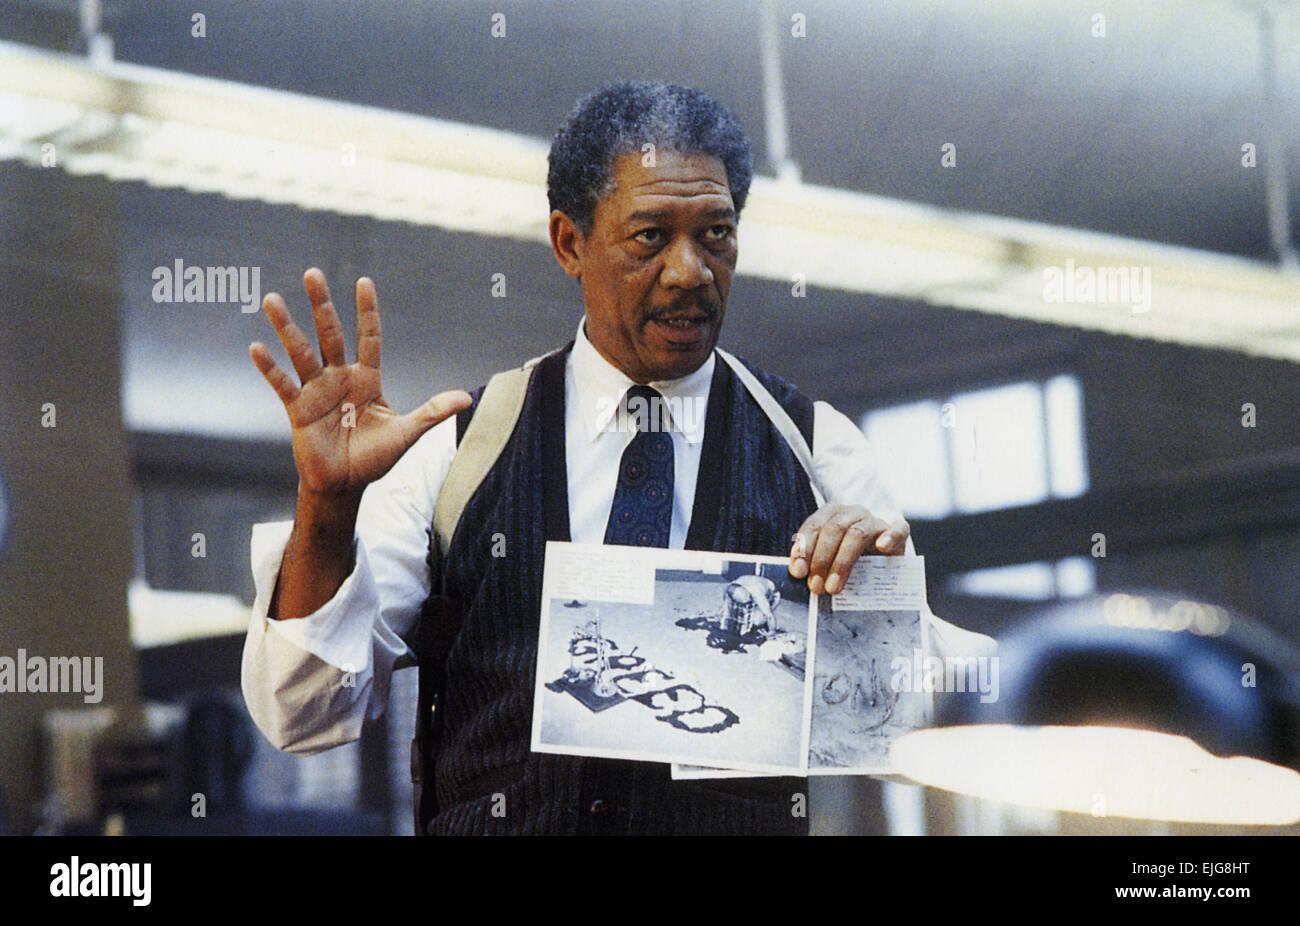 SE7EN 1995 New Line Cinema film with Morgan Freeman - Stock Image